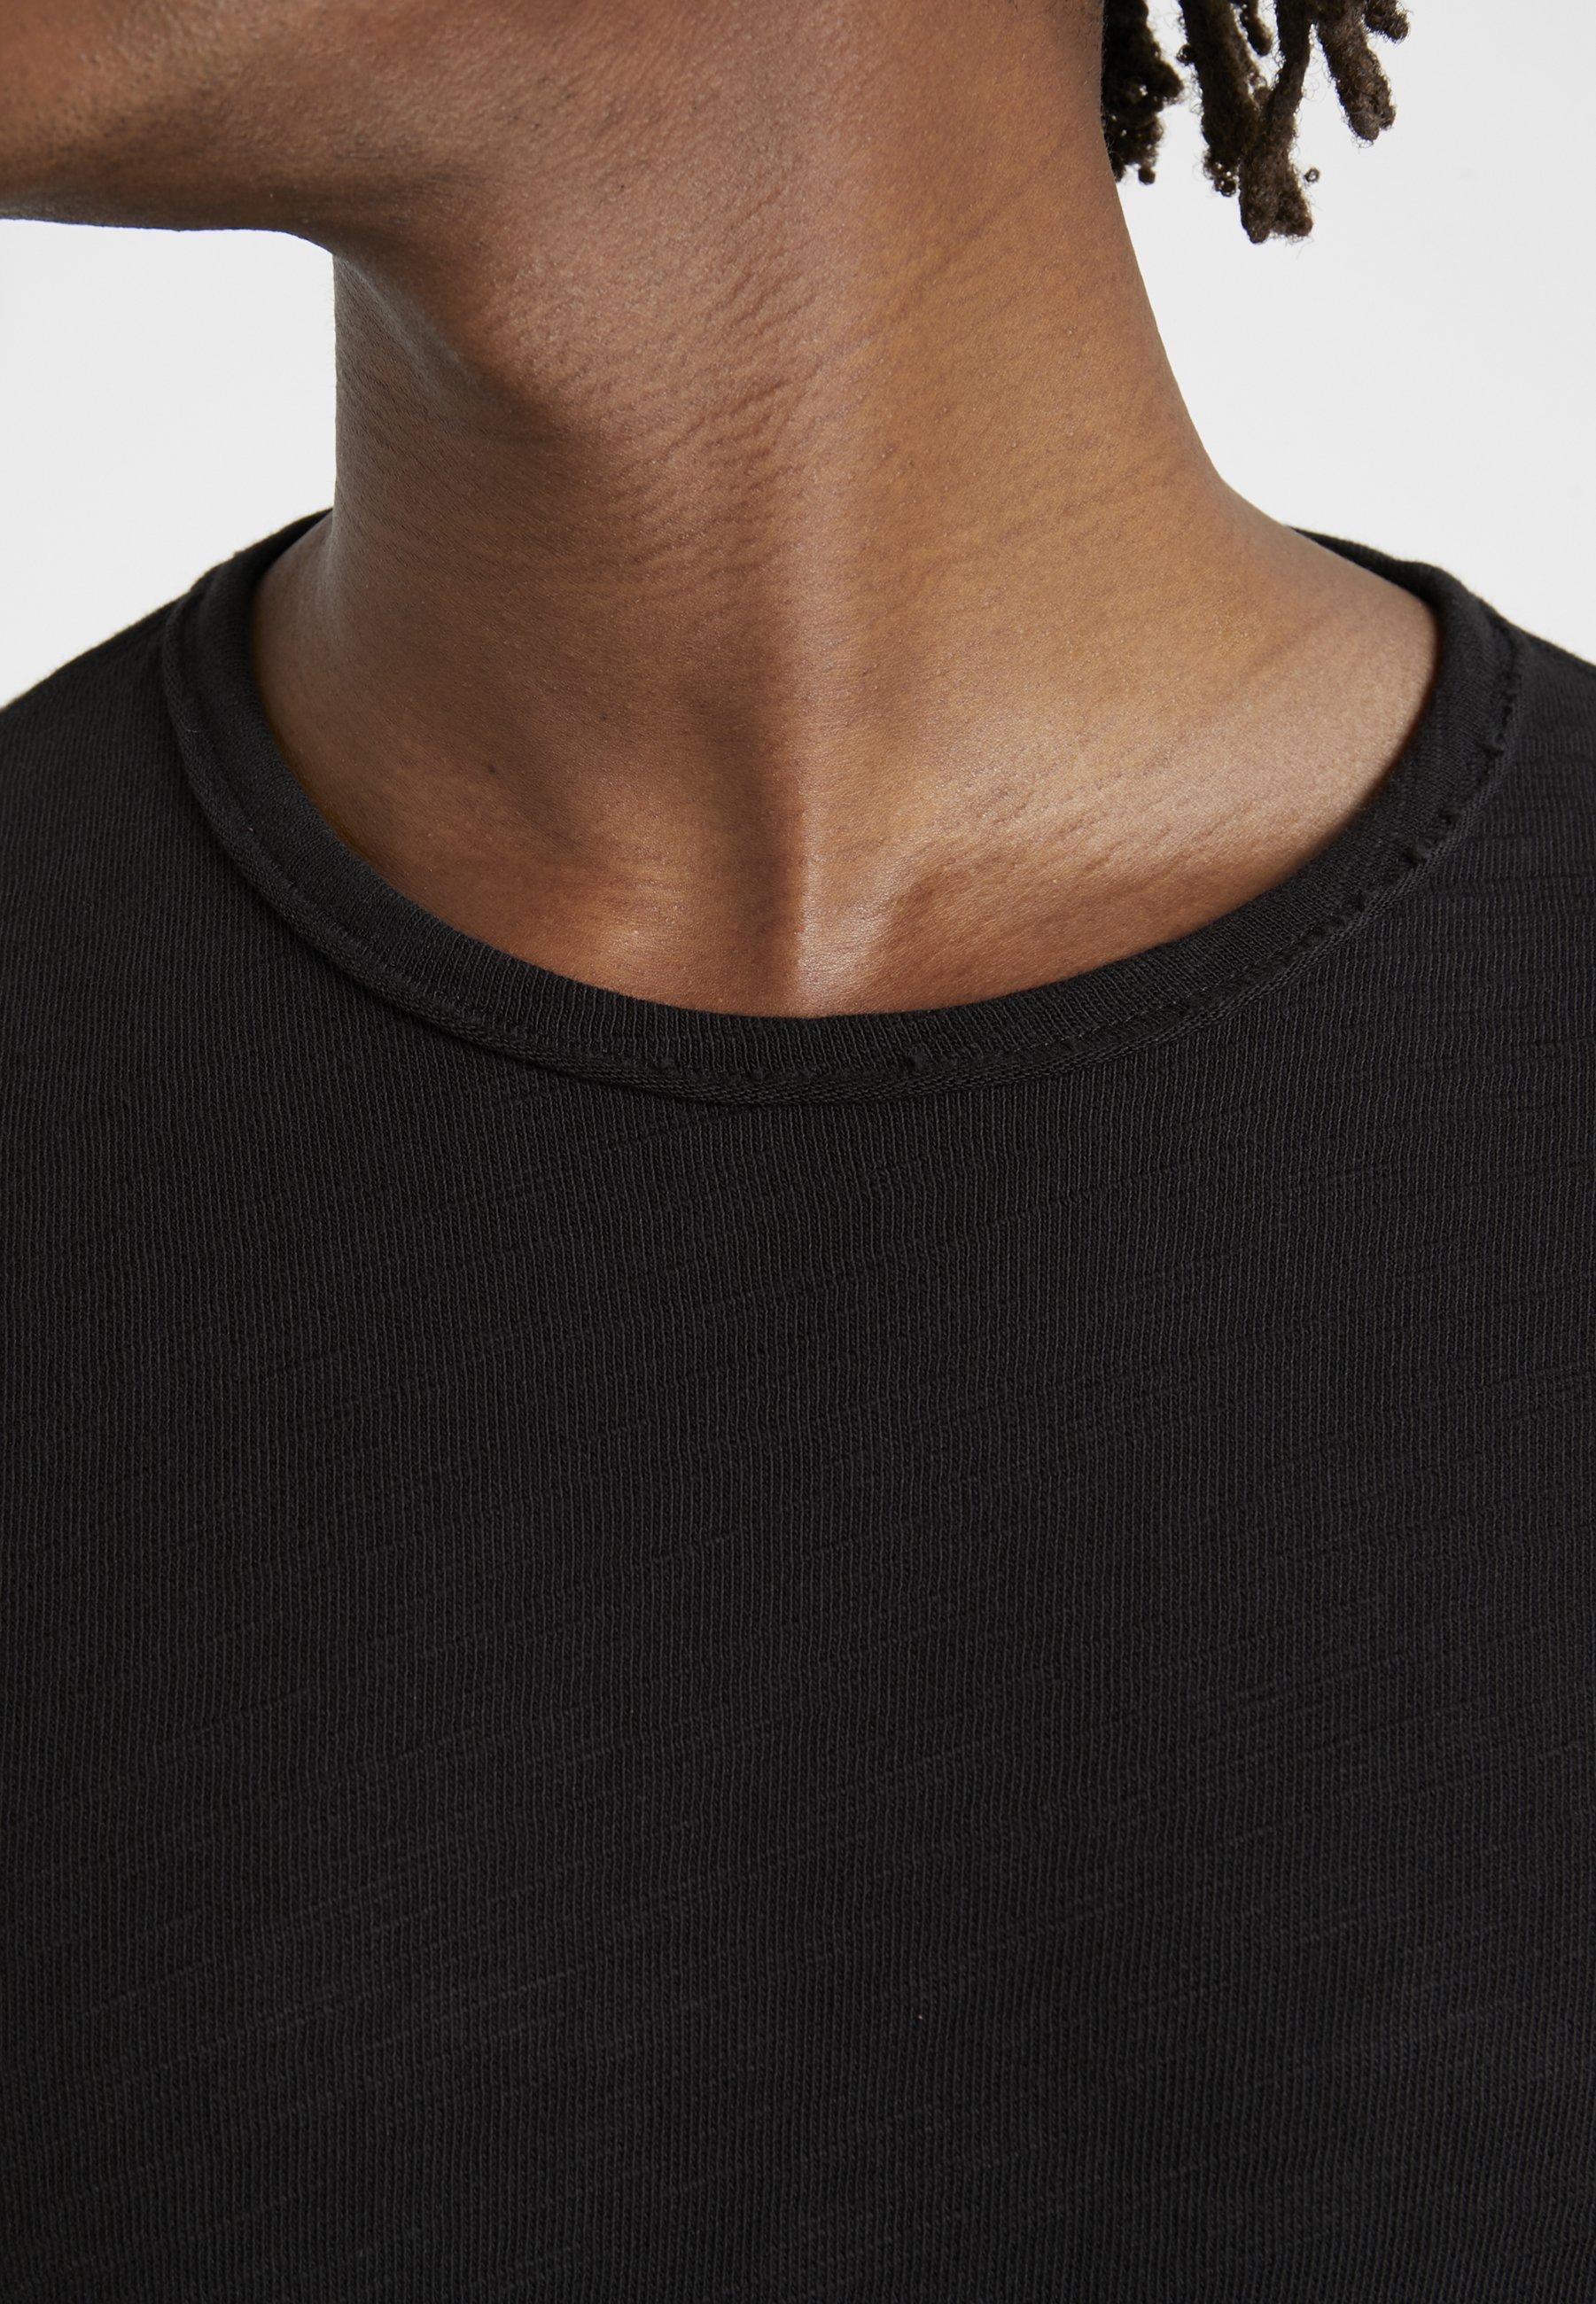 Rag & Bone Classic Tee - T-shirt Basic Black